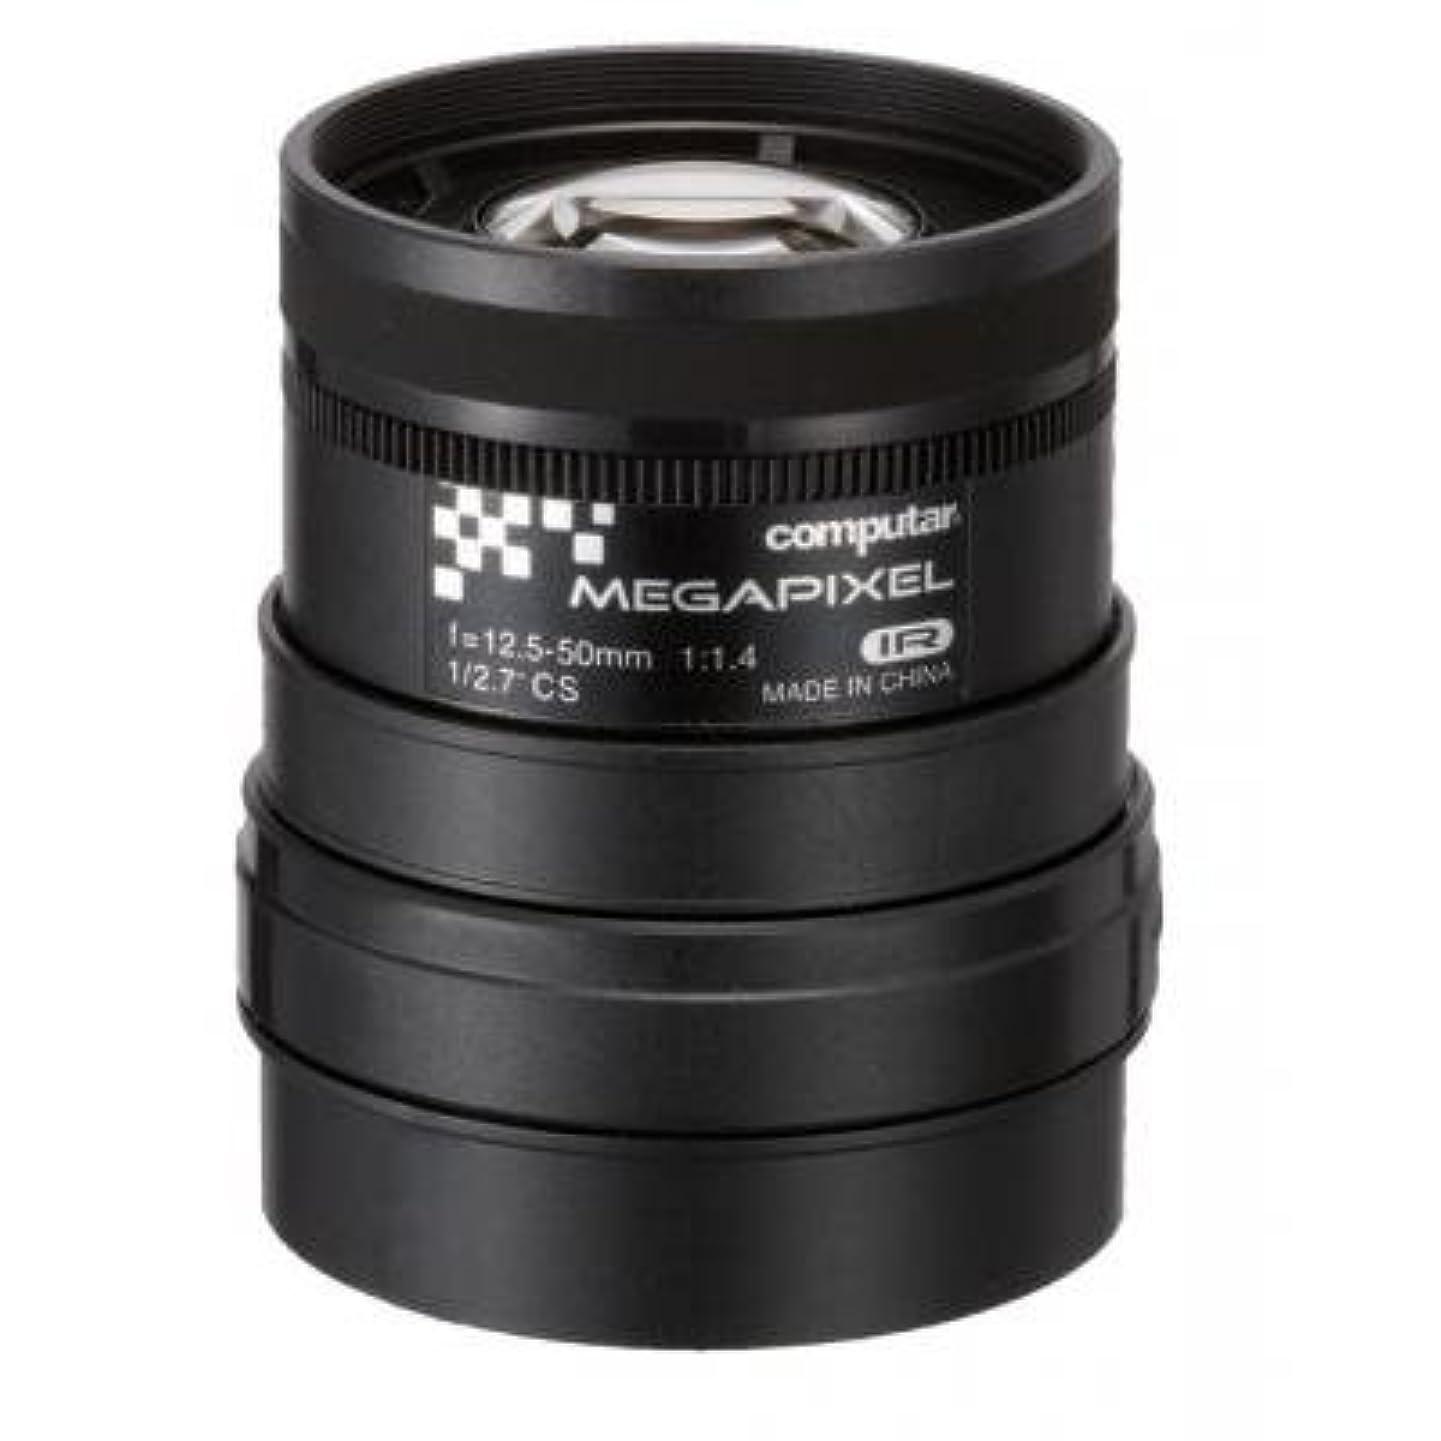 Computar Vari Focal Manual Iris 12.5-50mm f1.4 Lens for GoPro Hero3, Hero4, Ribcage Backbone Mod & CCTV Cameras